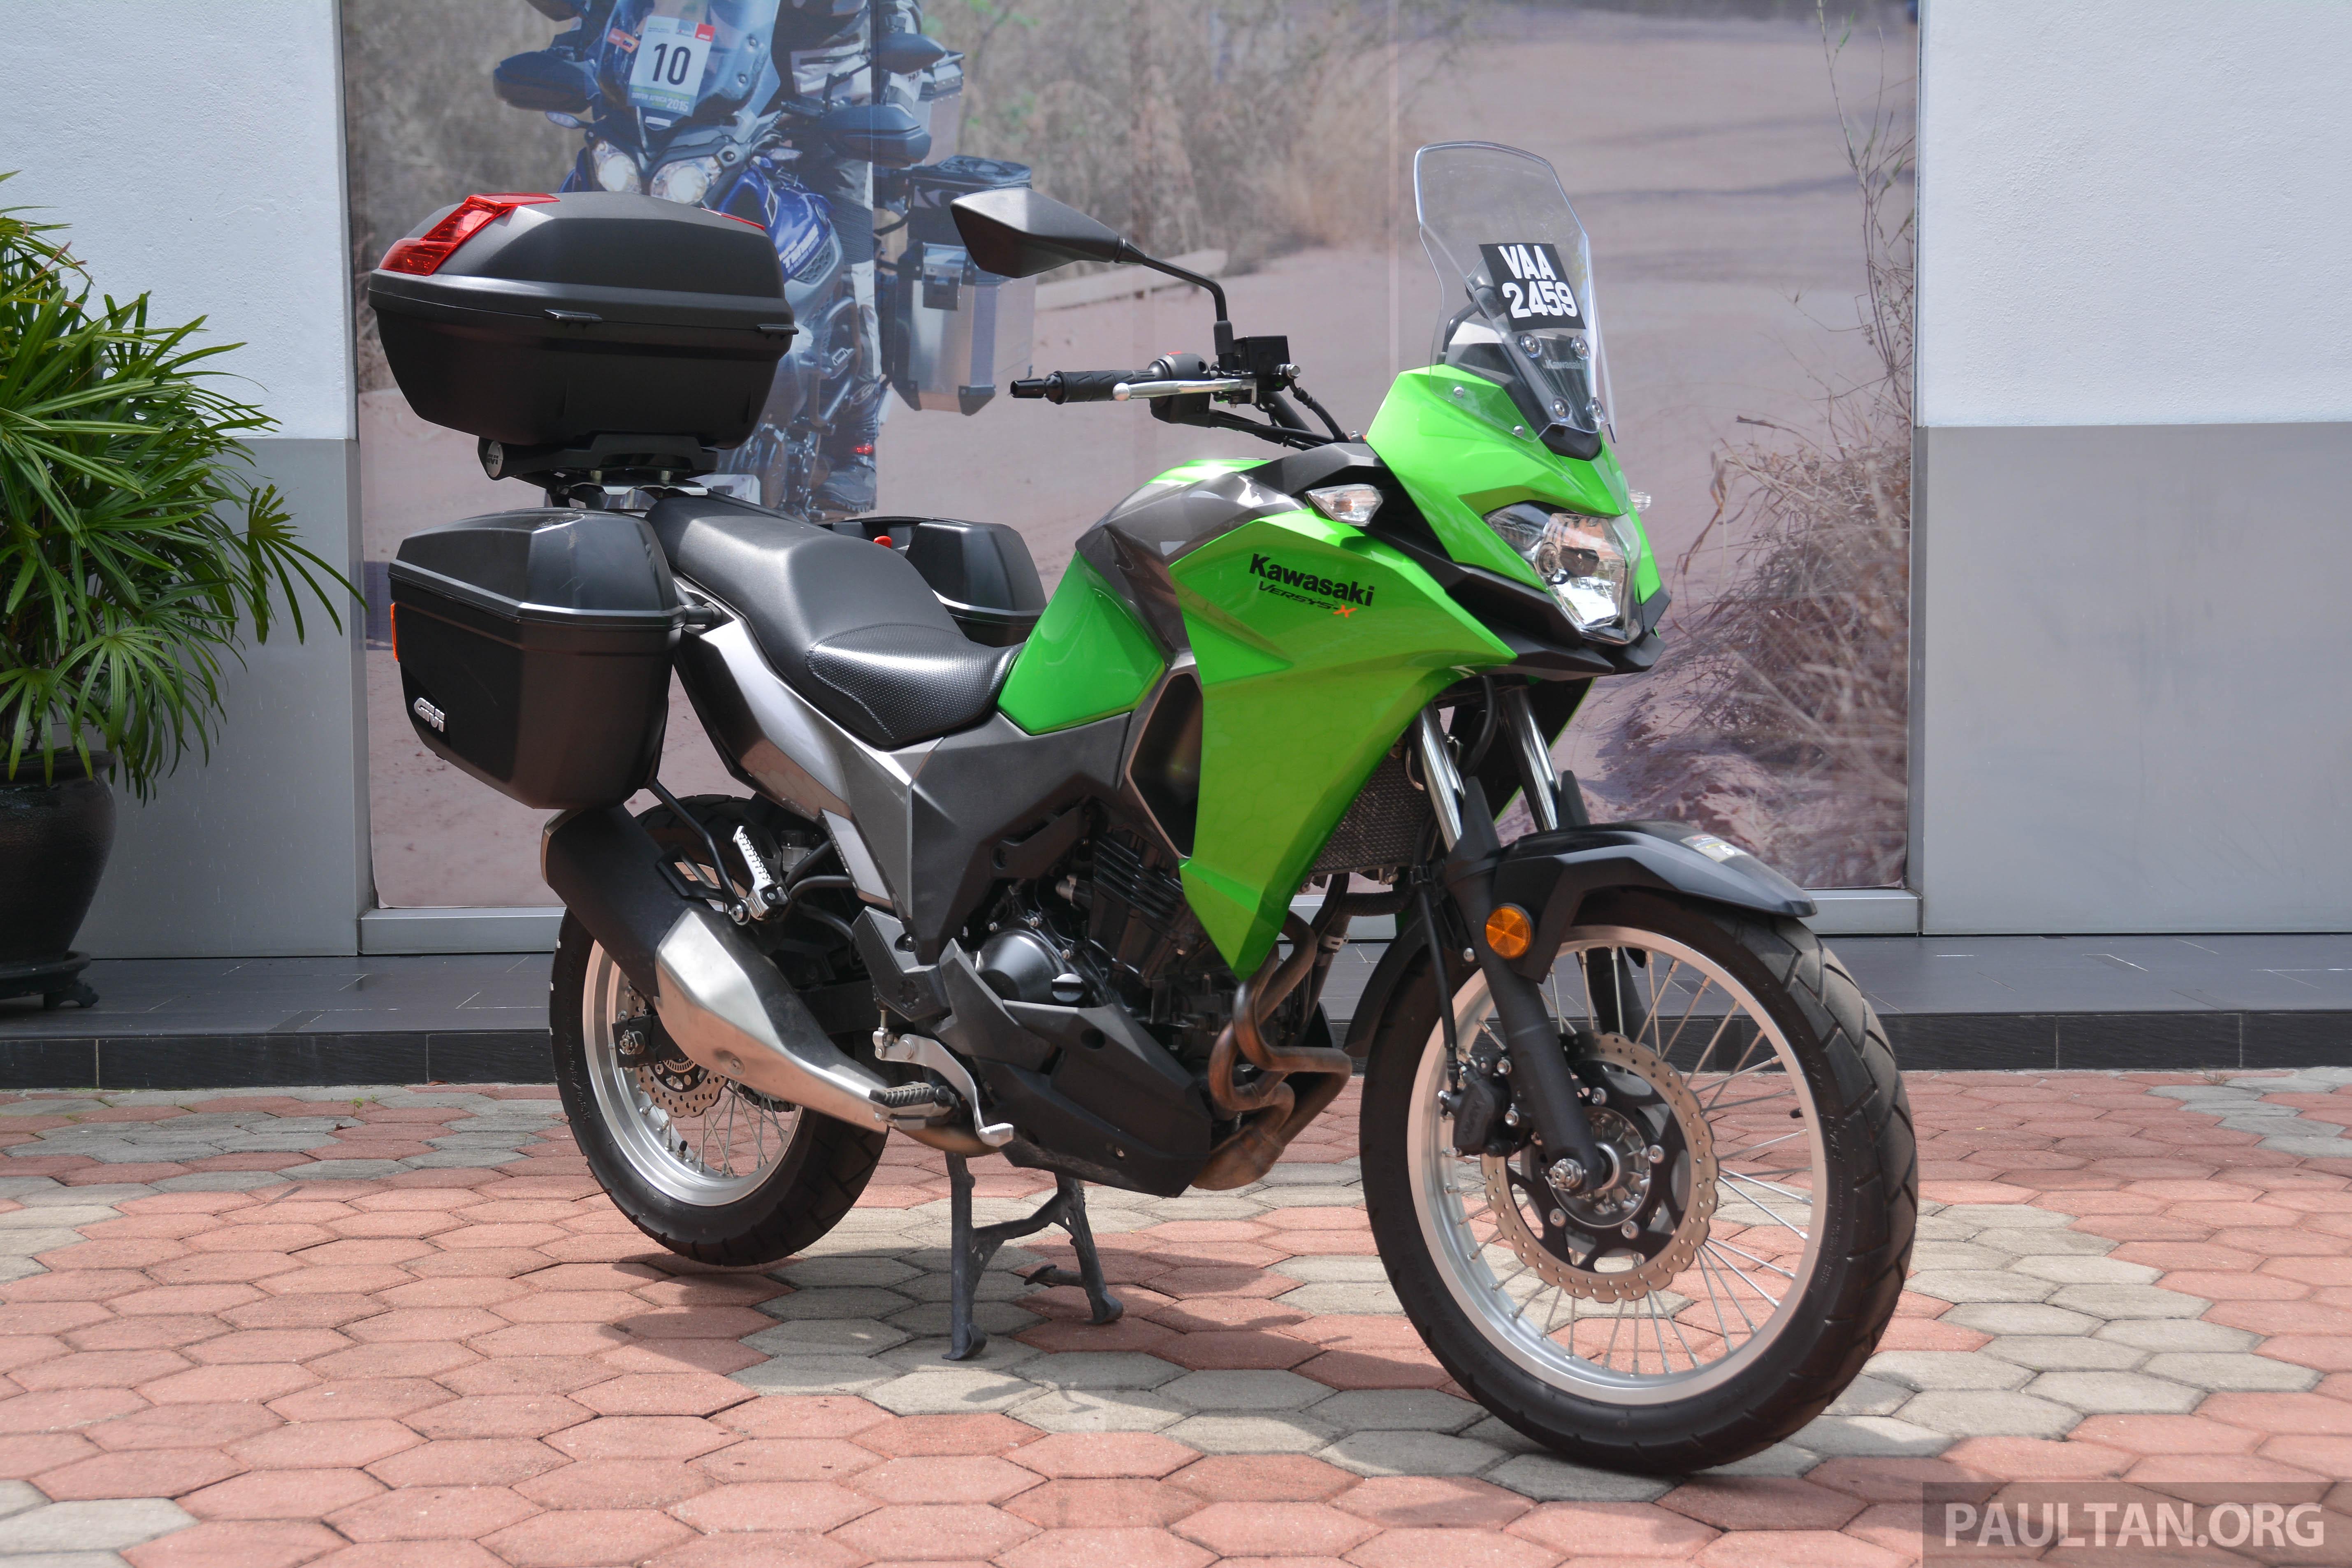 Kawasaki Versys Side Panniers